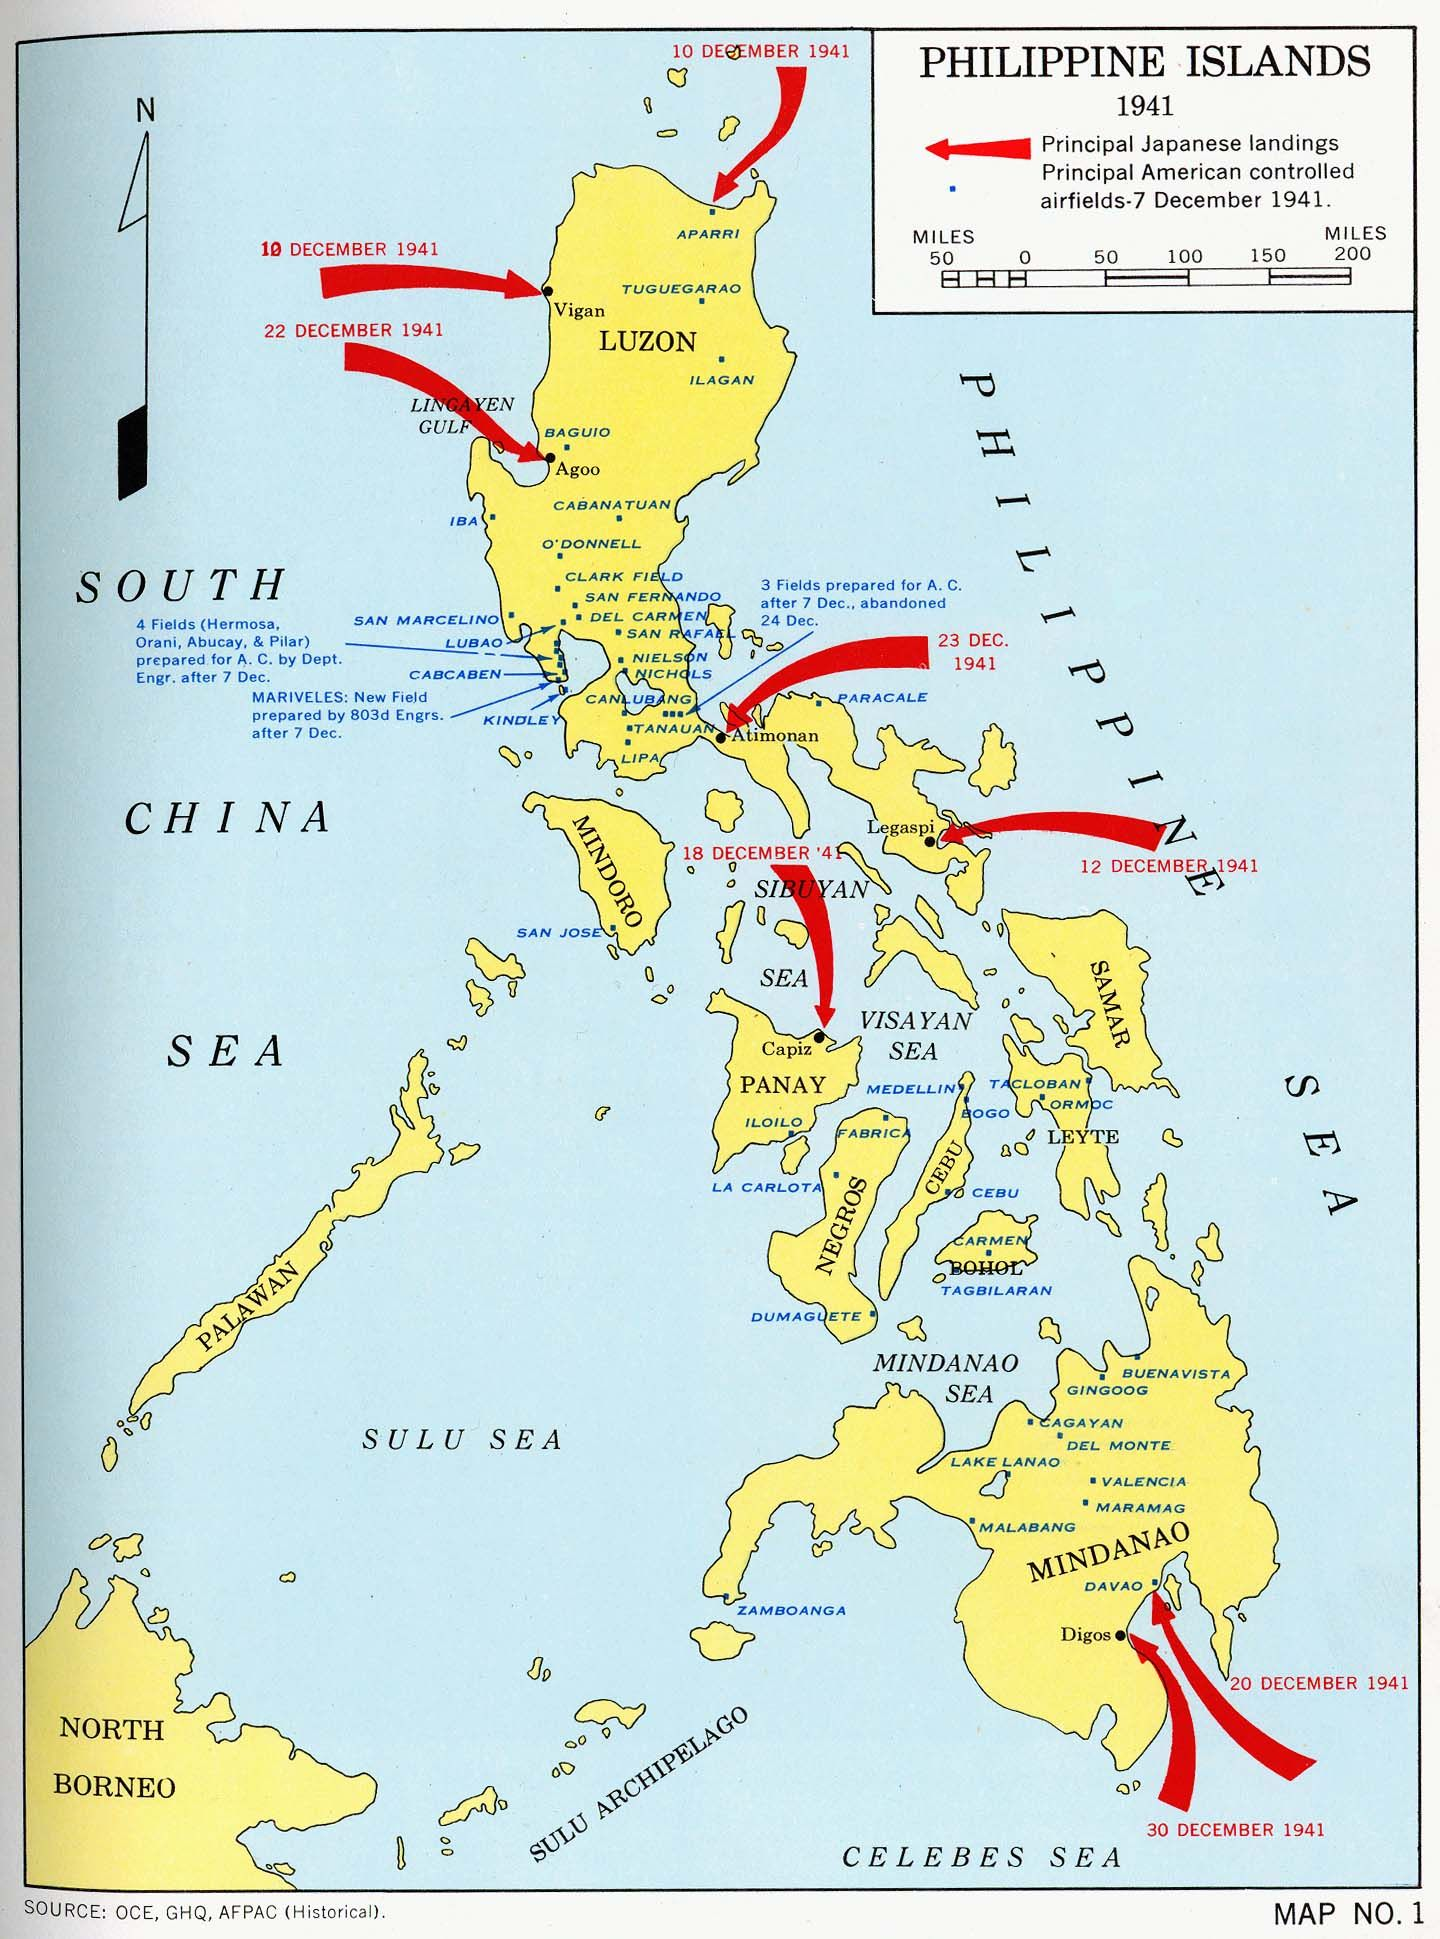 Philippine Islands - 1941 | Wwii maps, Island map, Island